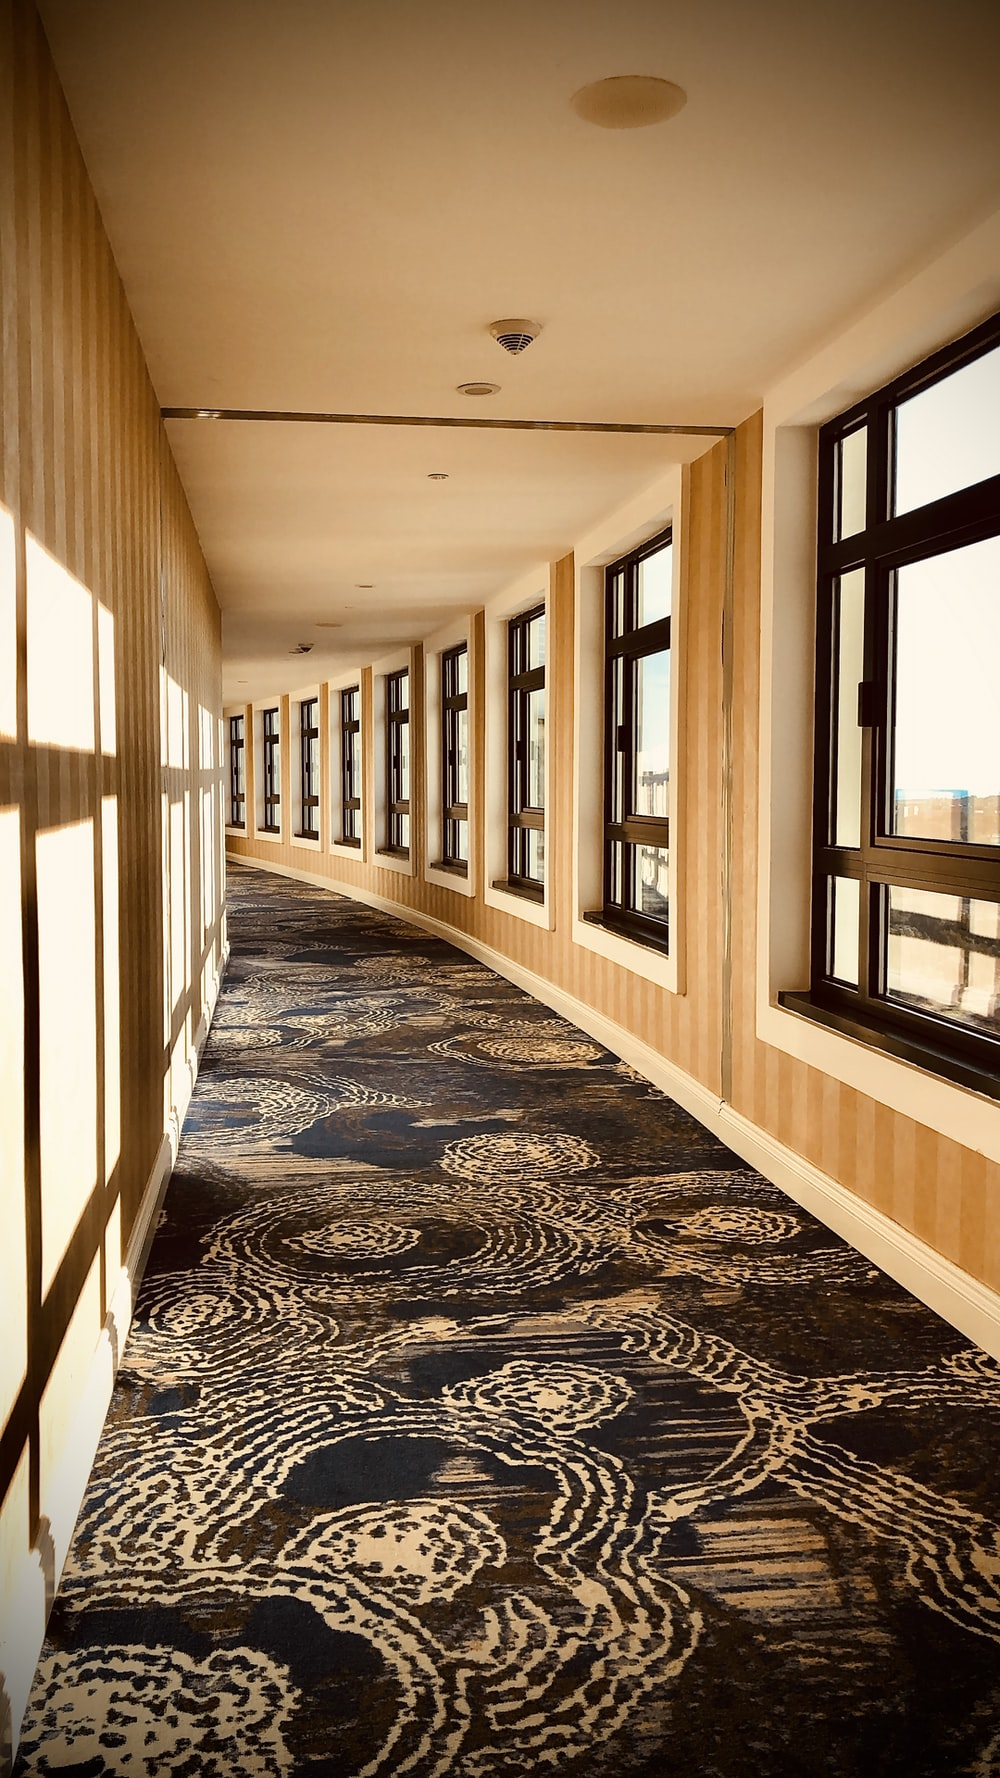 empty brown and black hallway